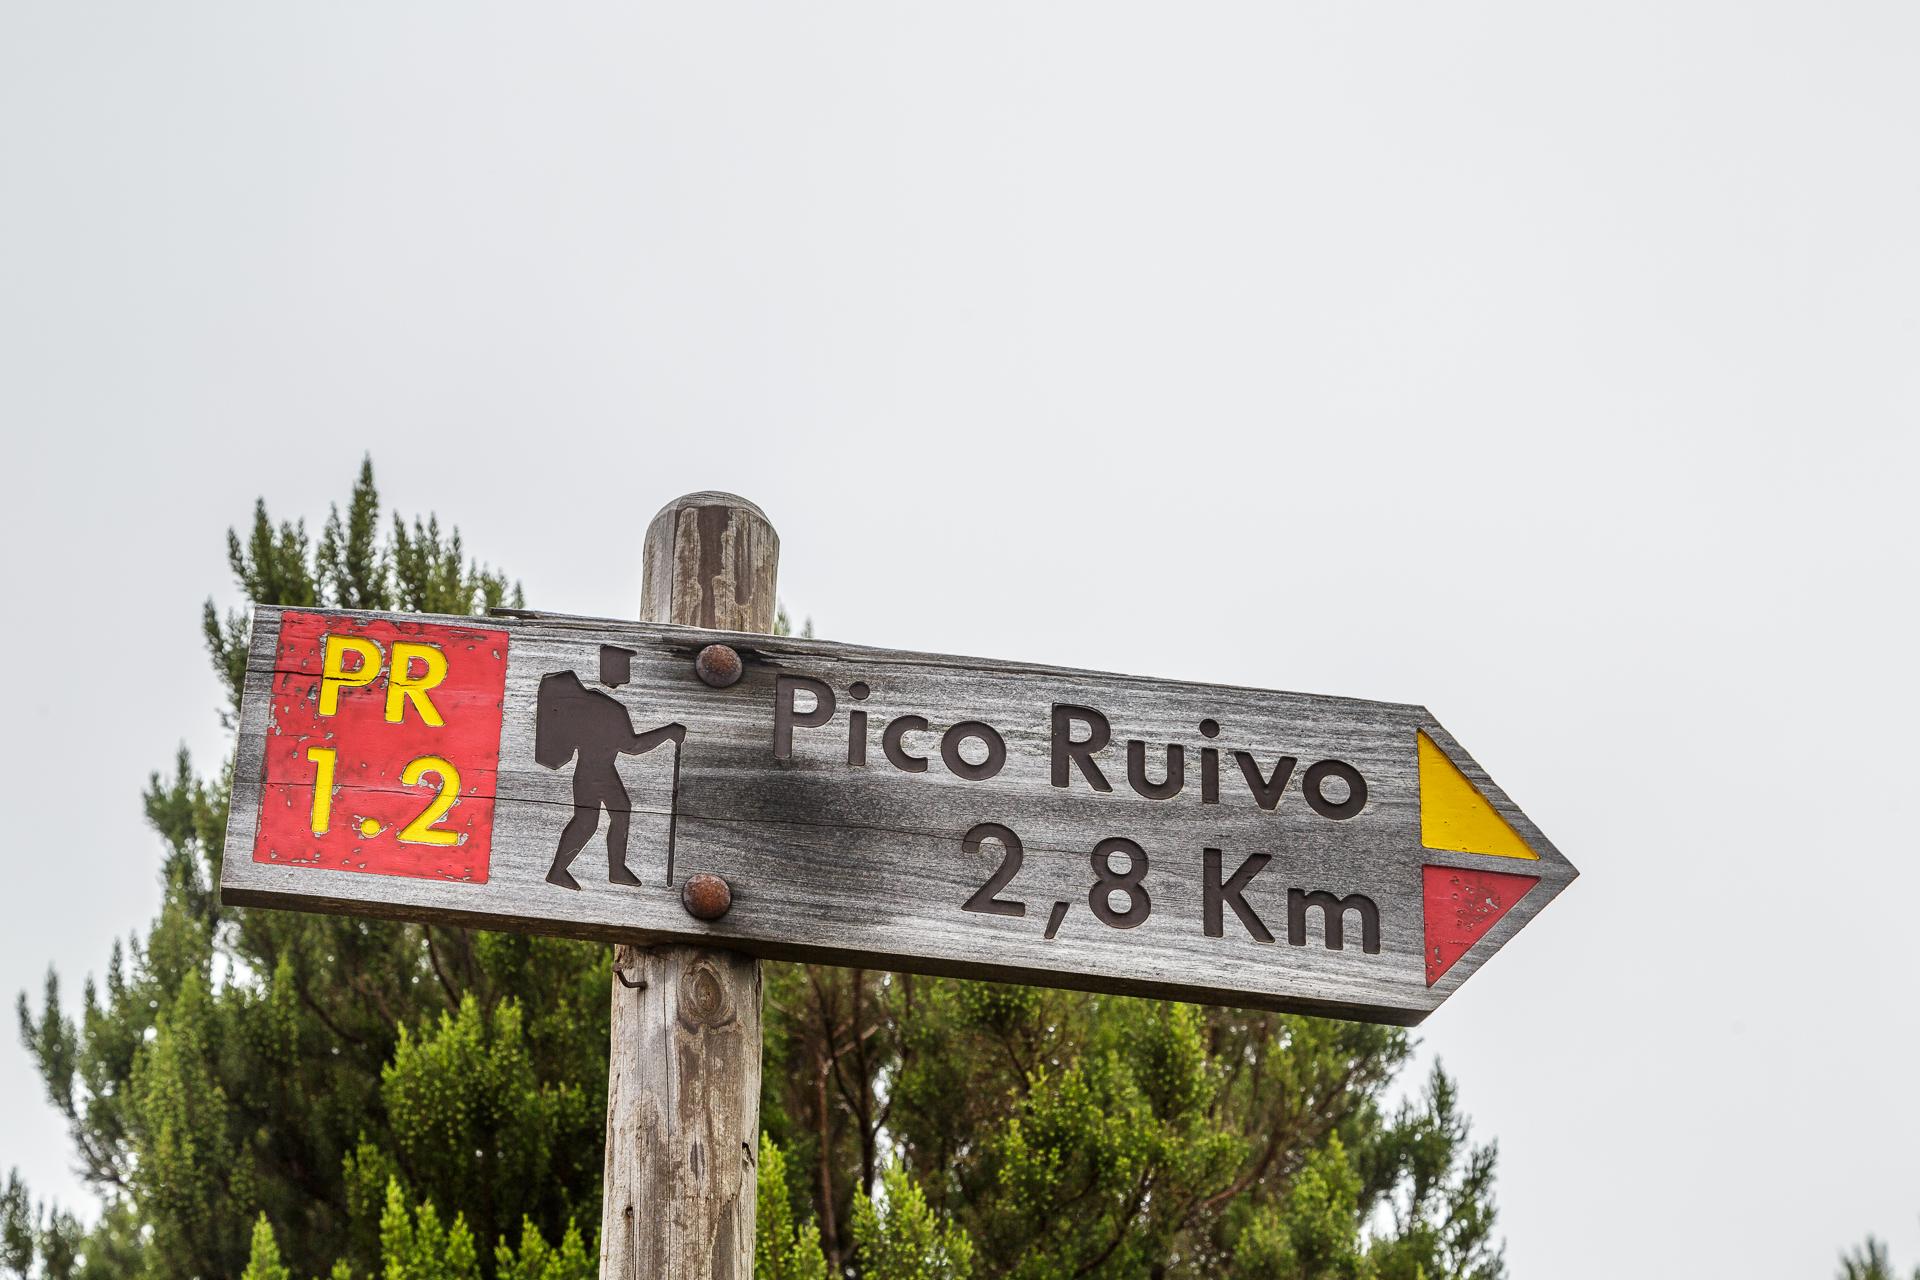 Wanderung-Pico-Ruivo-Achada-do-Texeira